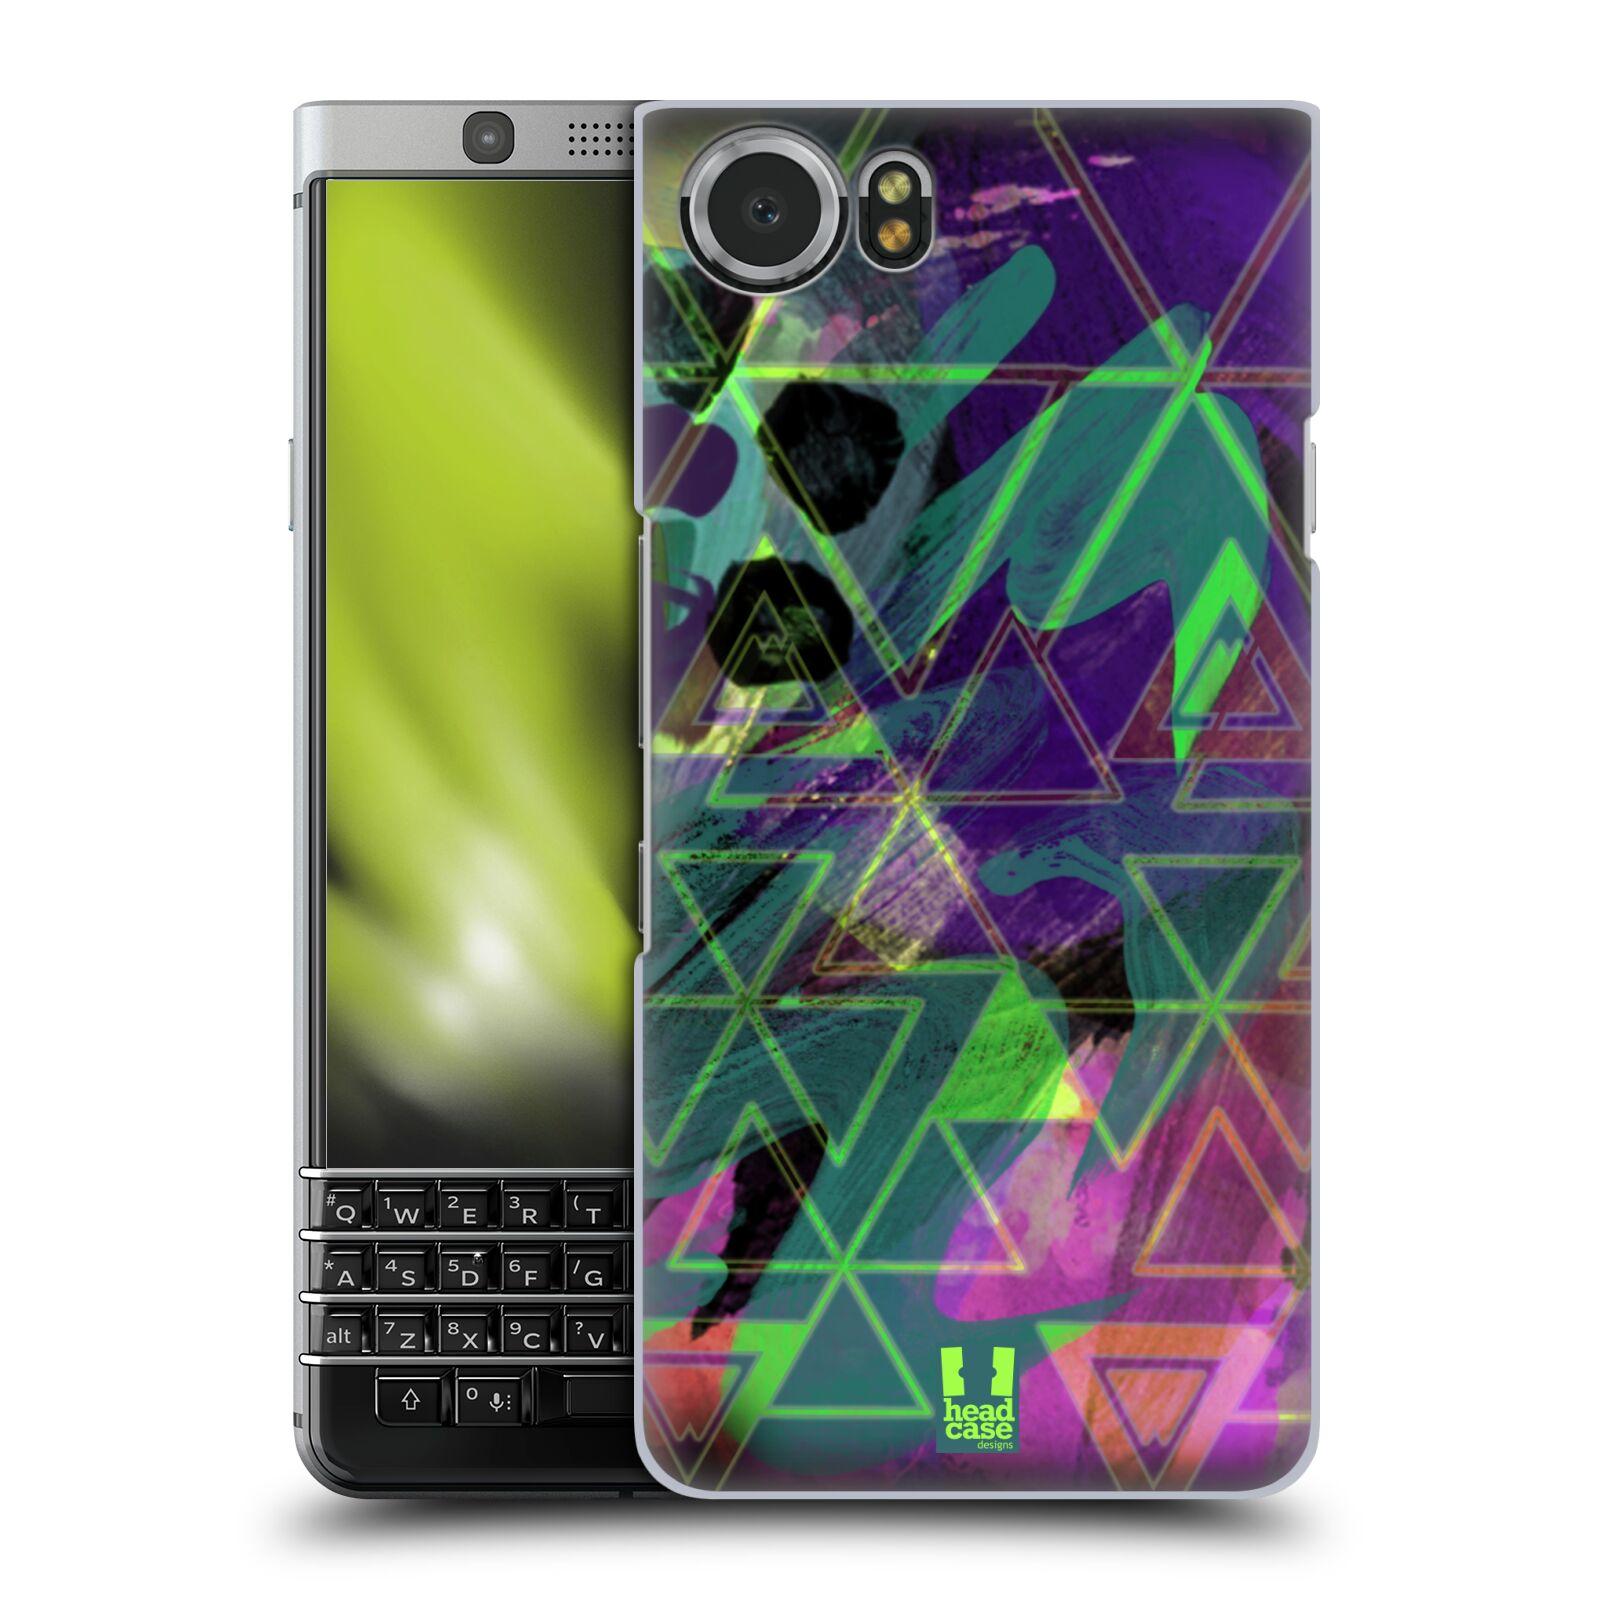 HEAD-CASE-DESIGNS-NEON-PATTERNS-HARD-BACK-CASE-FOR-BLACKBERRY-PHONES